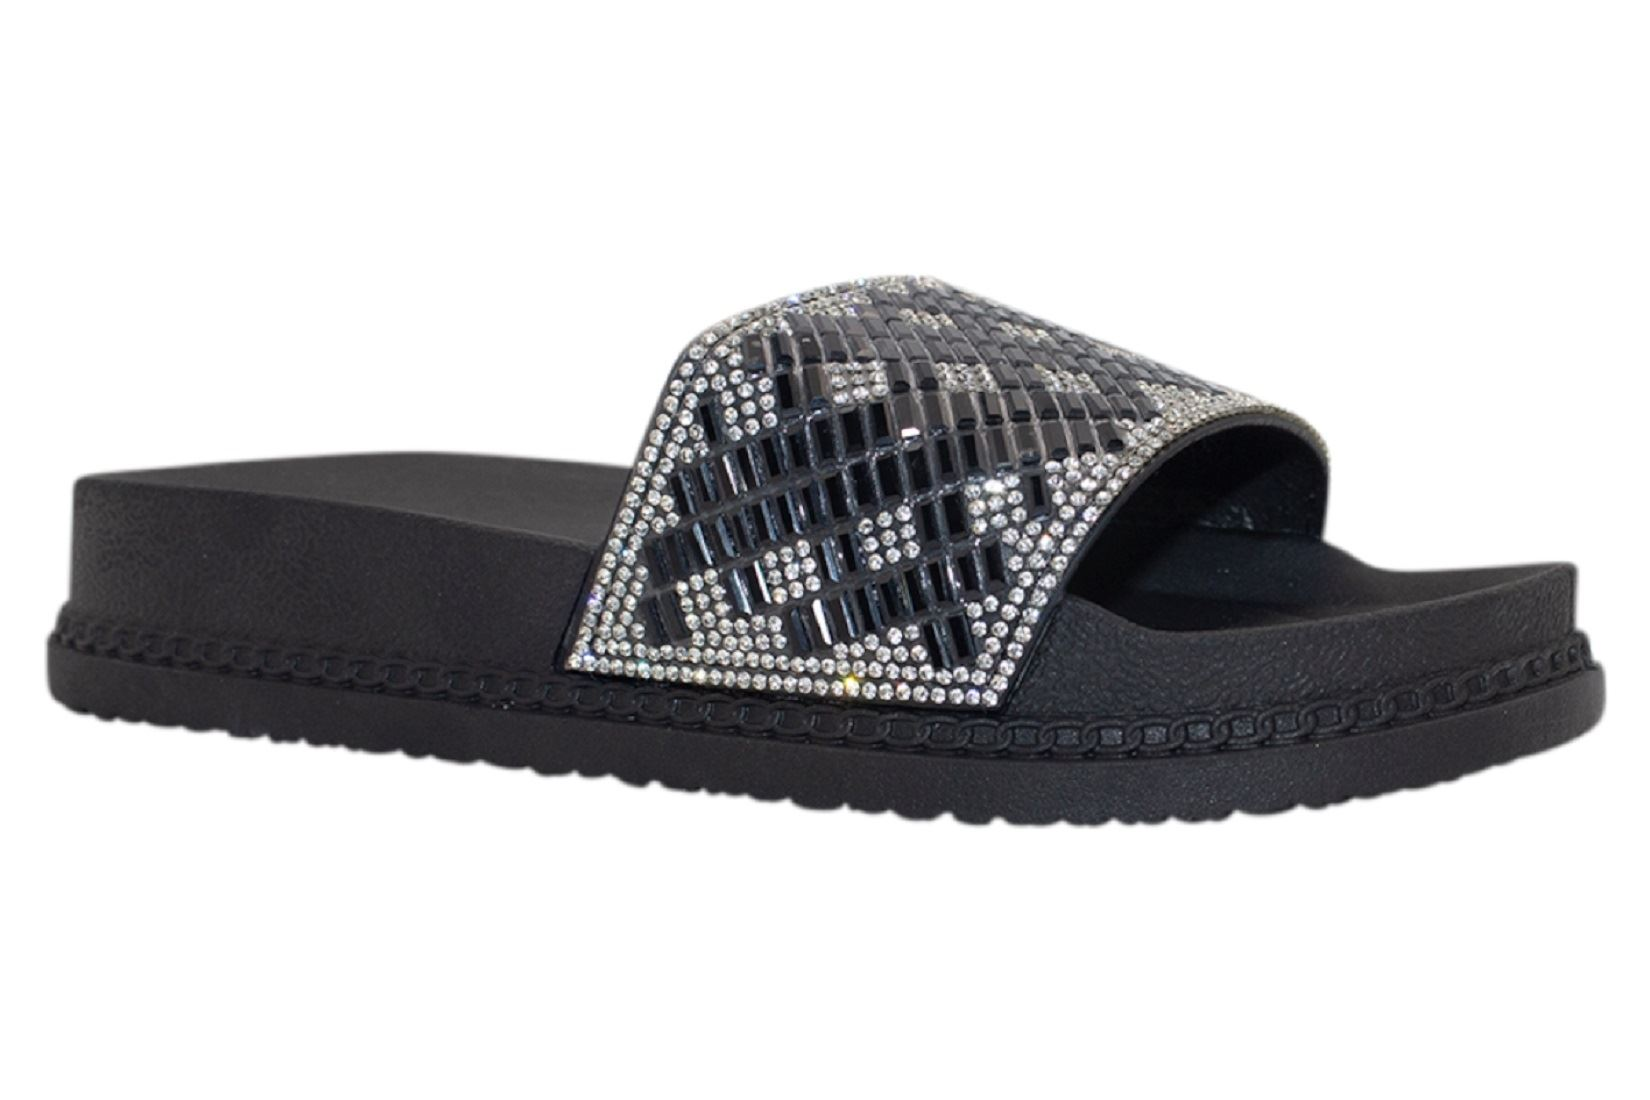 Womens-Sliders-Casual-Slippers-Mules-Ladies-Diamante-Flip-Flop-Sandals-Shoes thumbnail 38